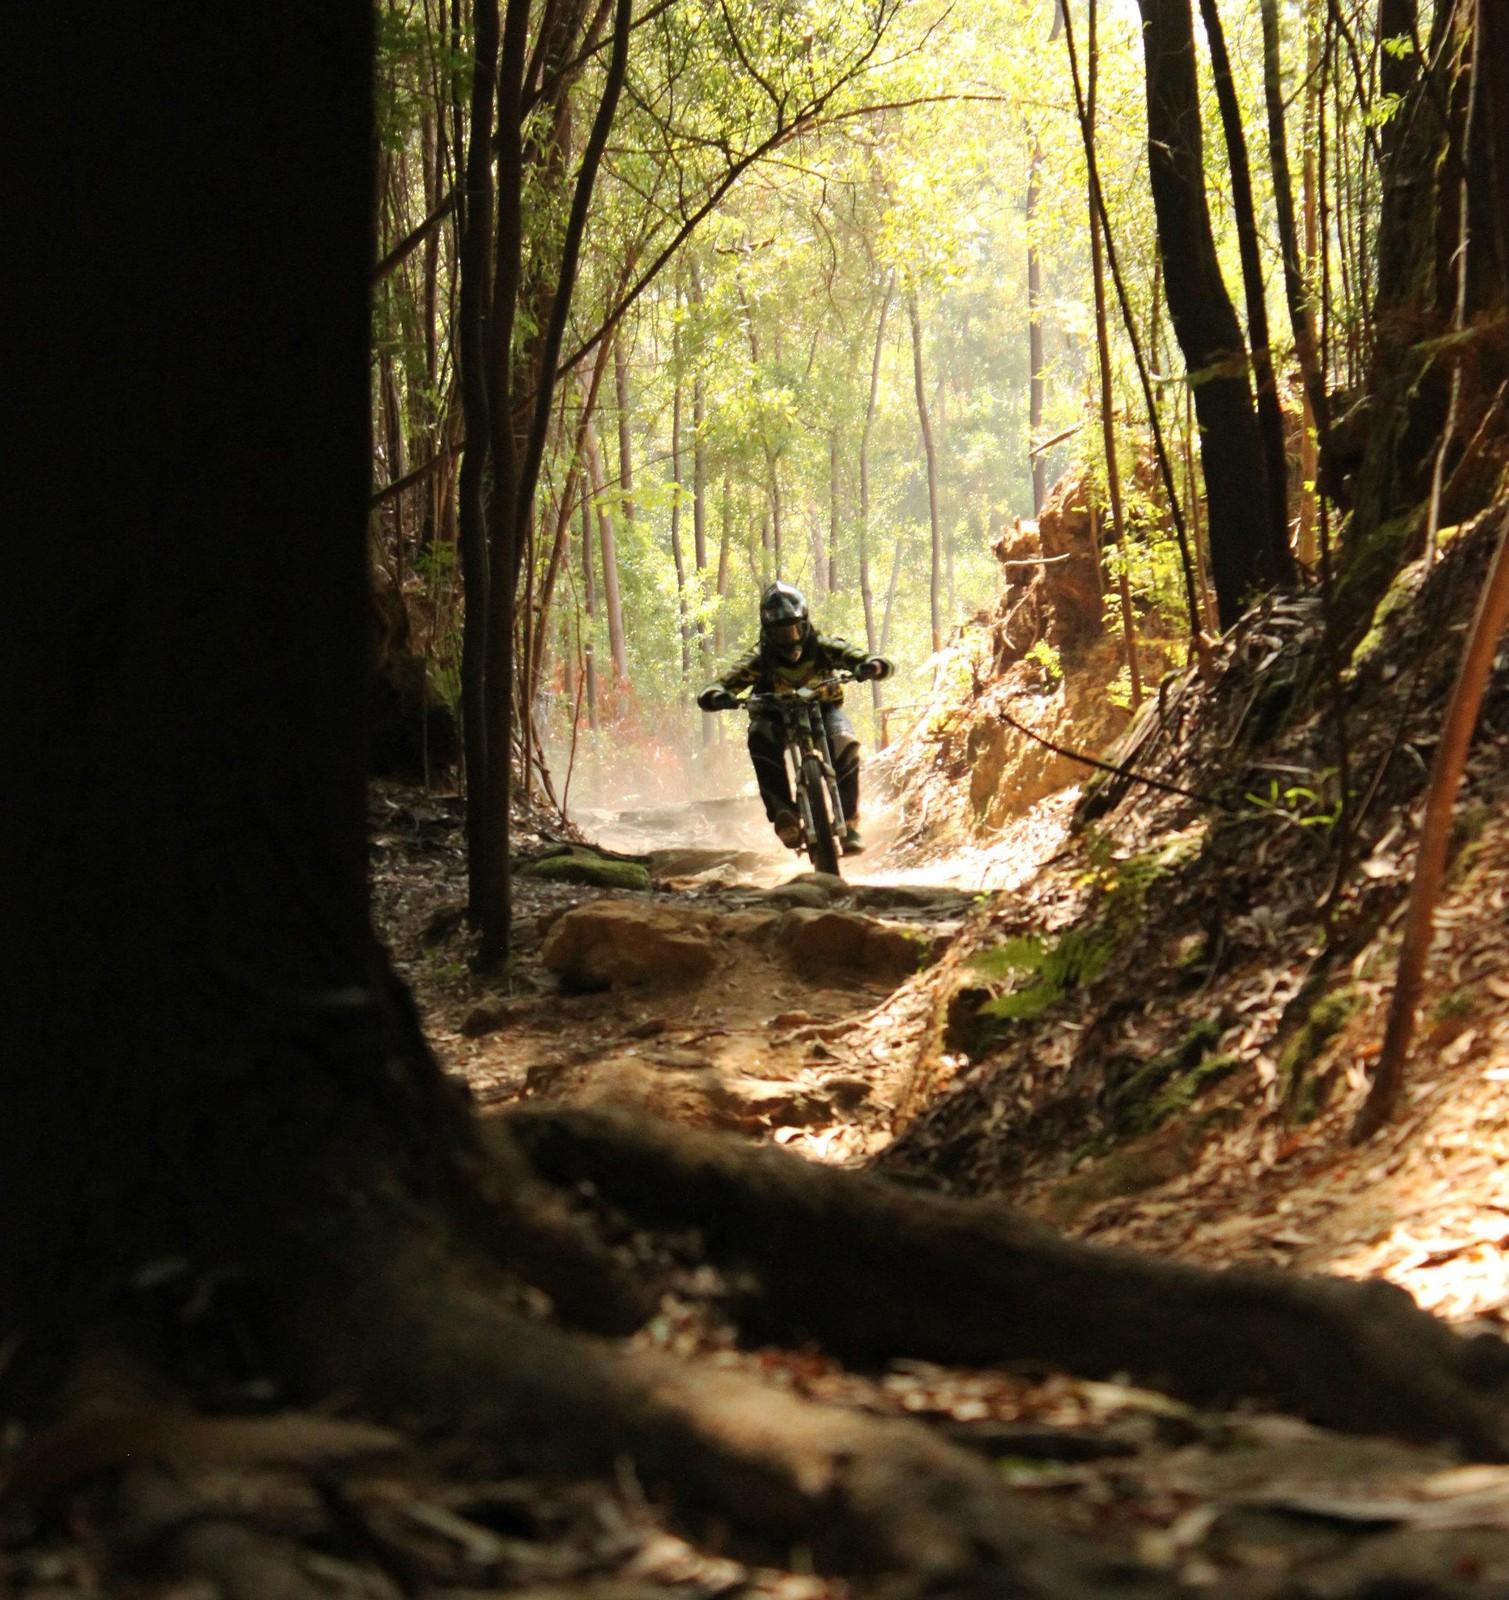 Rock garden - DoubleCrownKing - Mountain Biking Pictures - Vital MTB